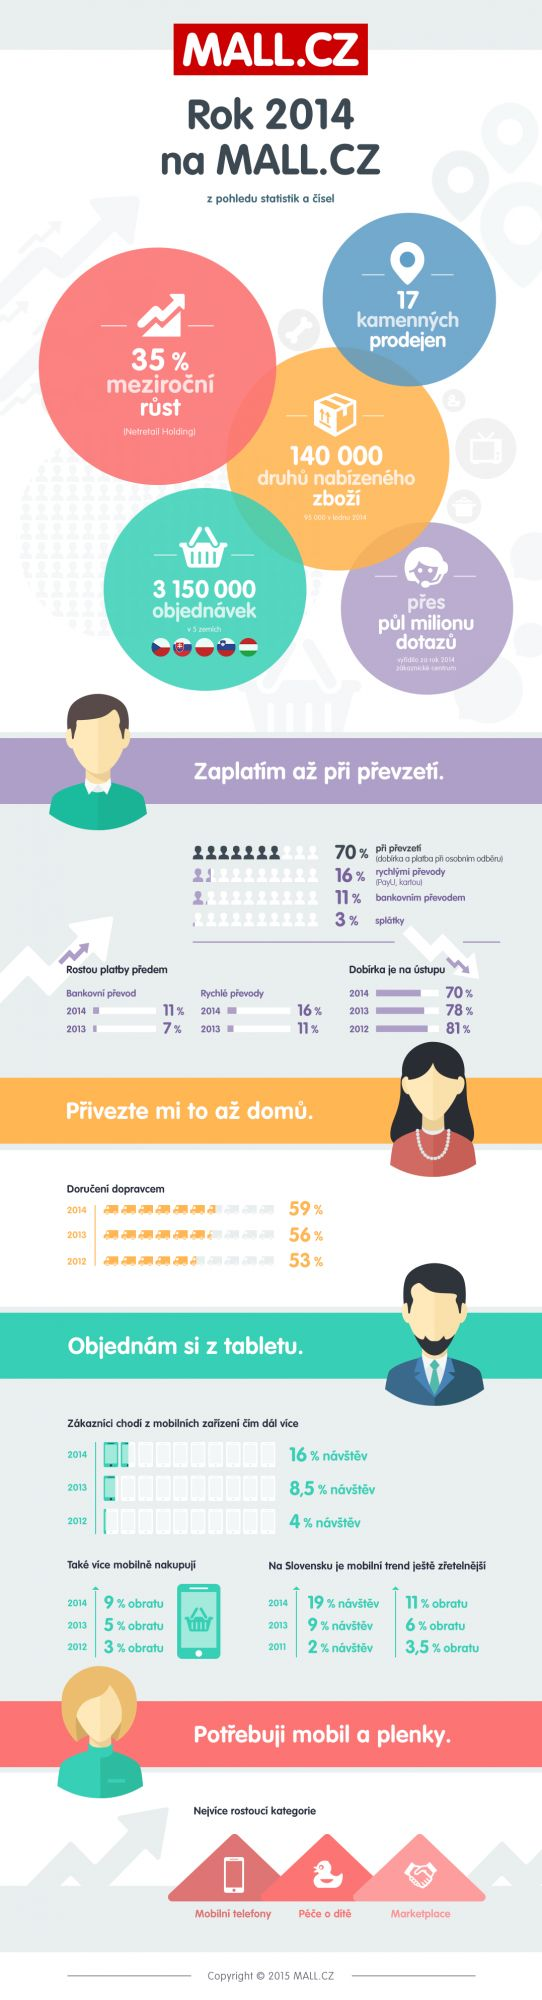 Statistics of Mall.cz in 2014